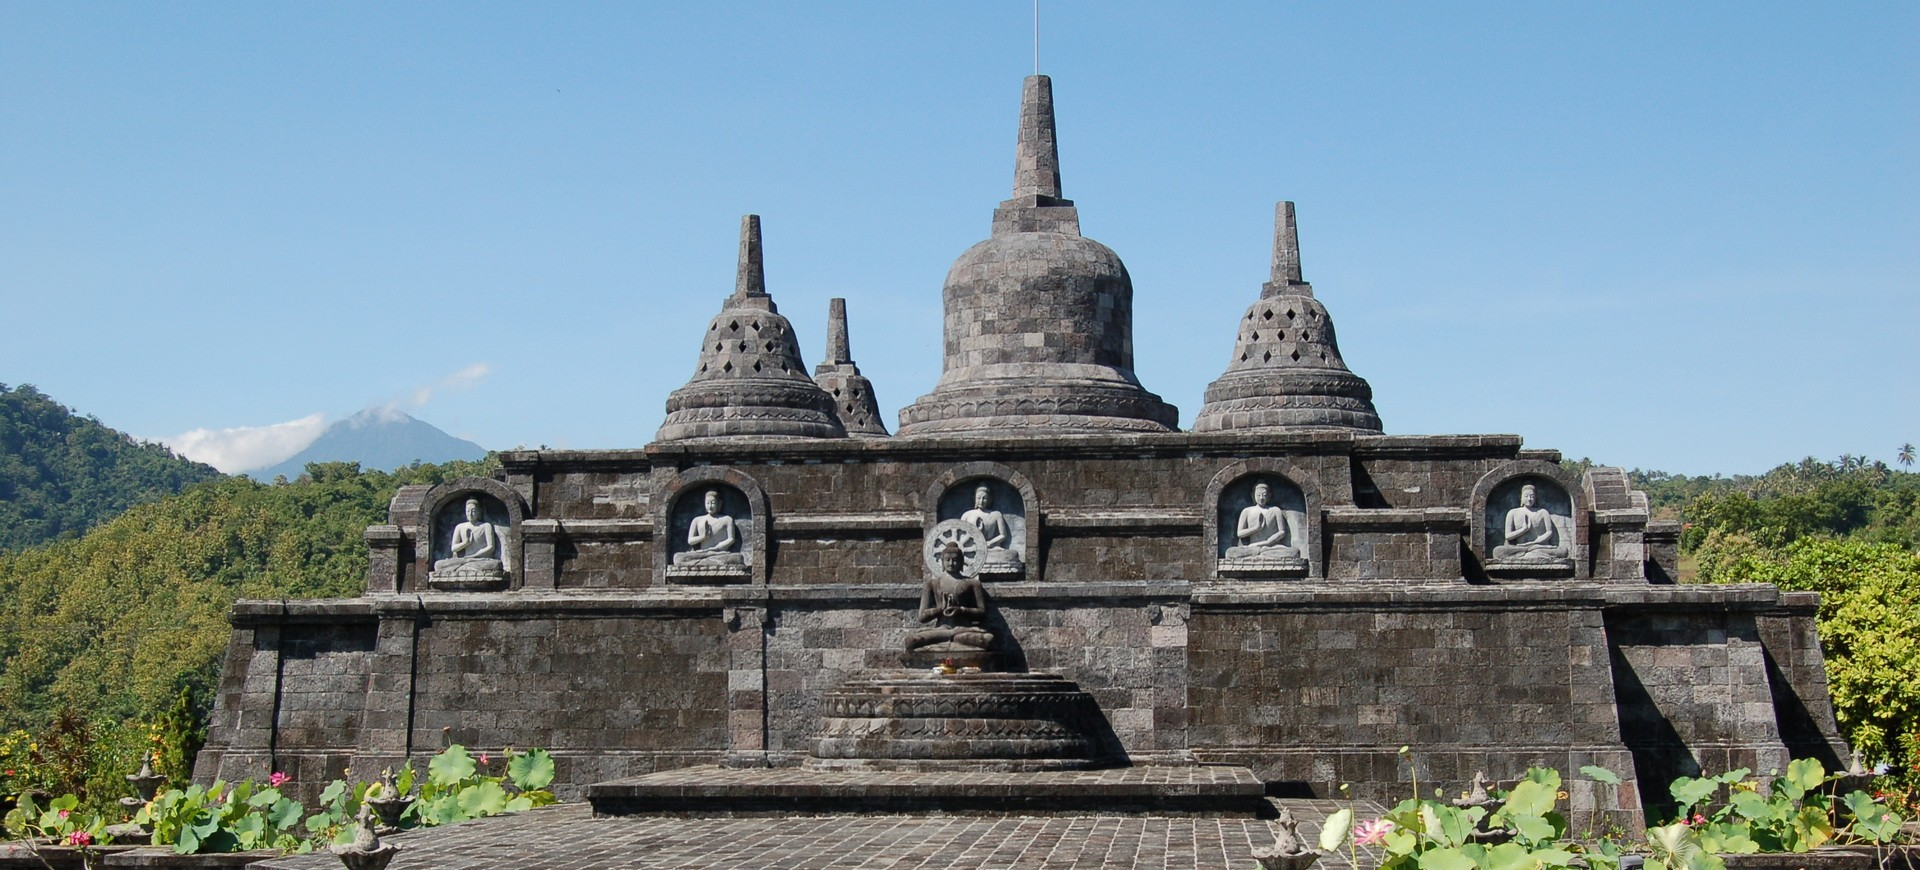 Monument Banjar à Bali